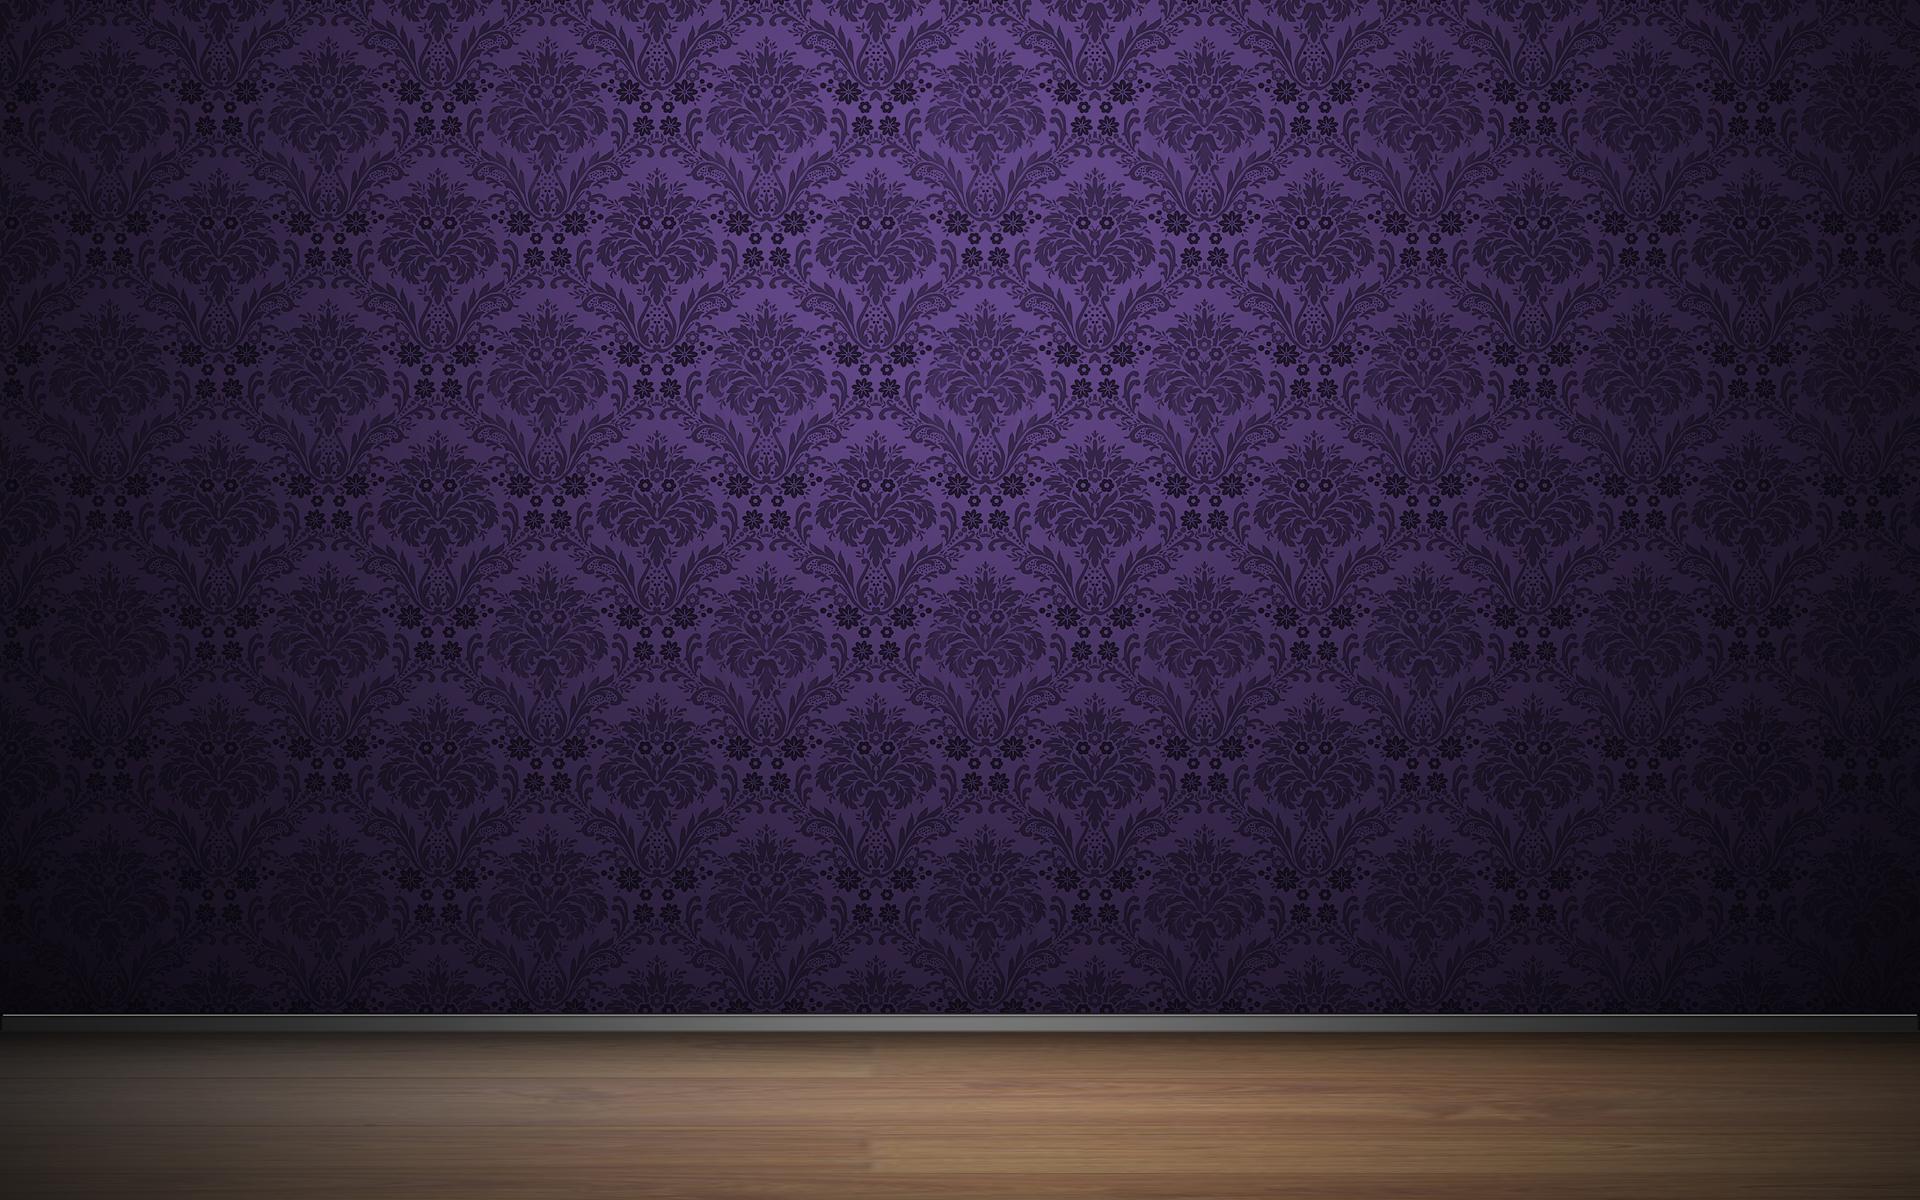 Purple vintage pattern wallpaper   42466 1920x1200